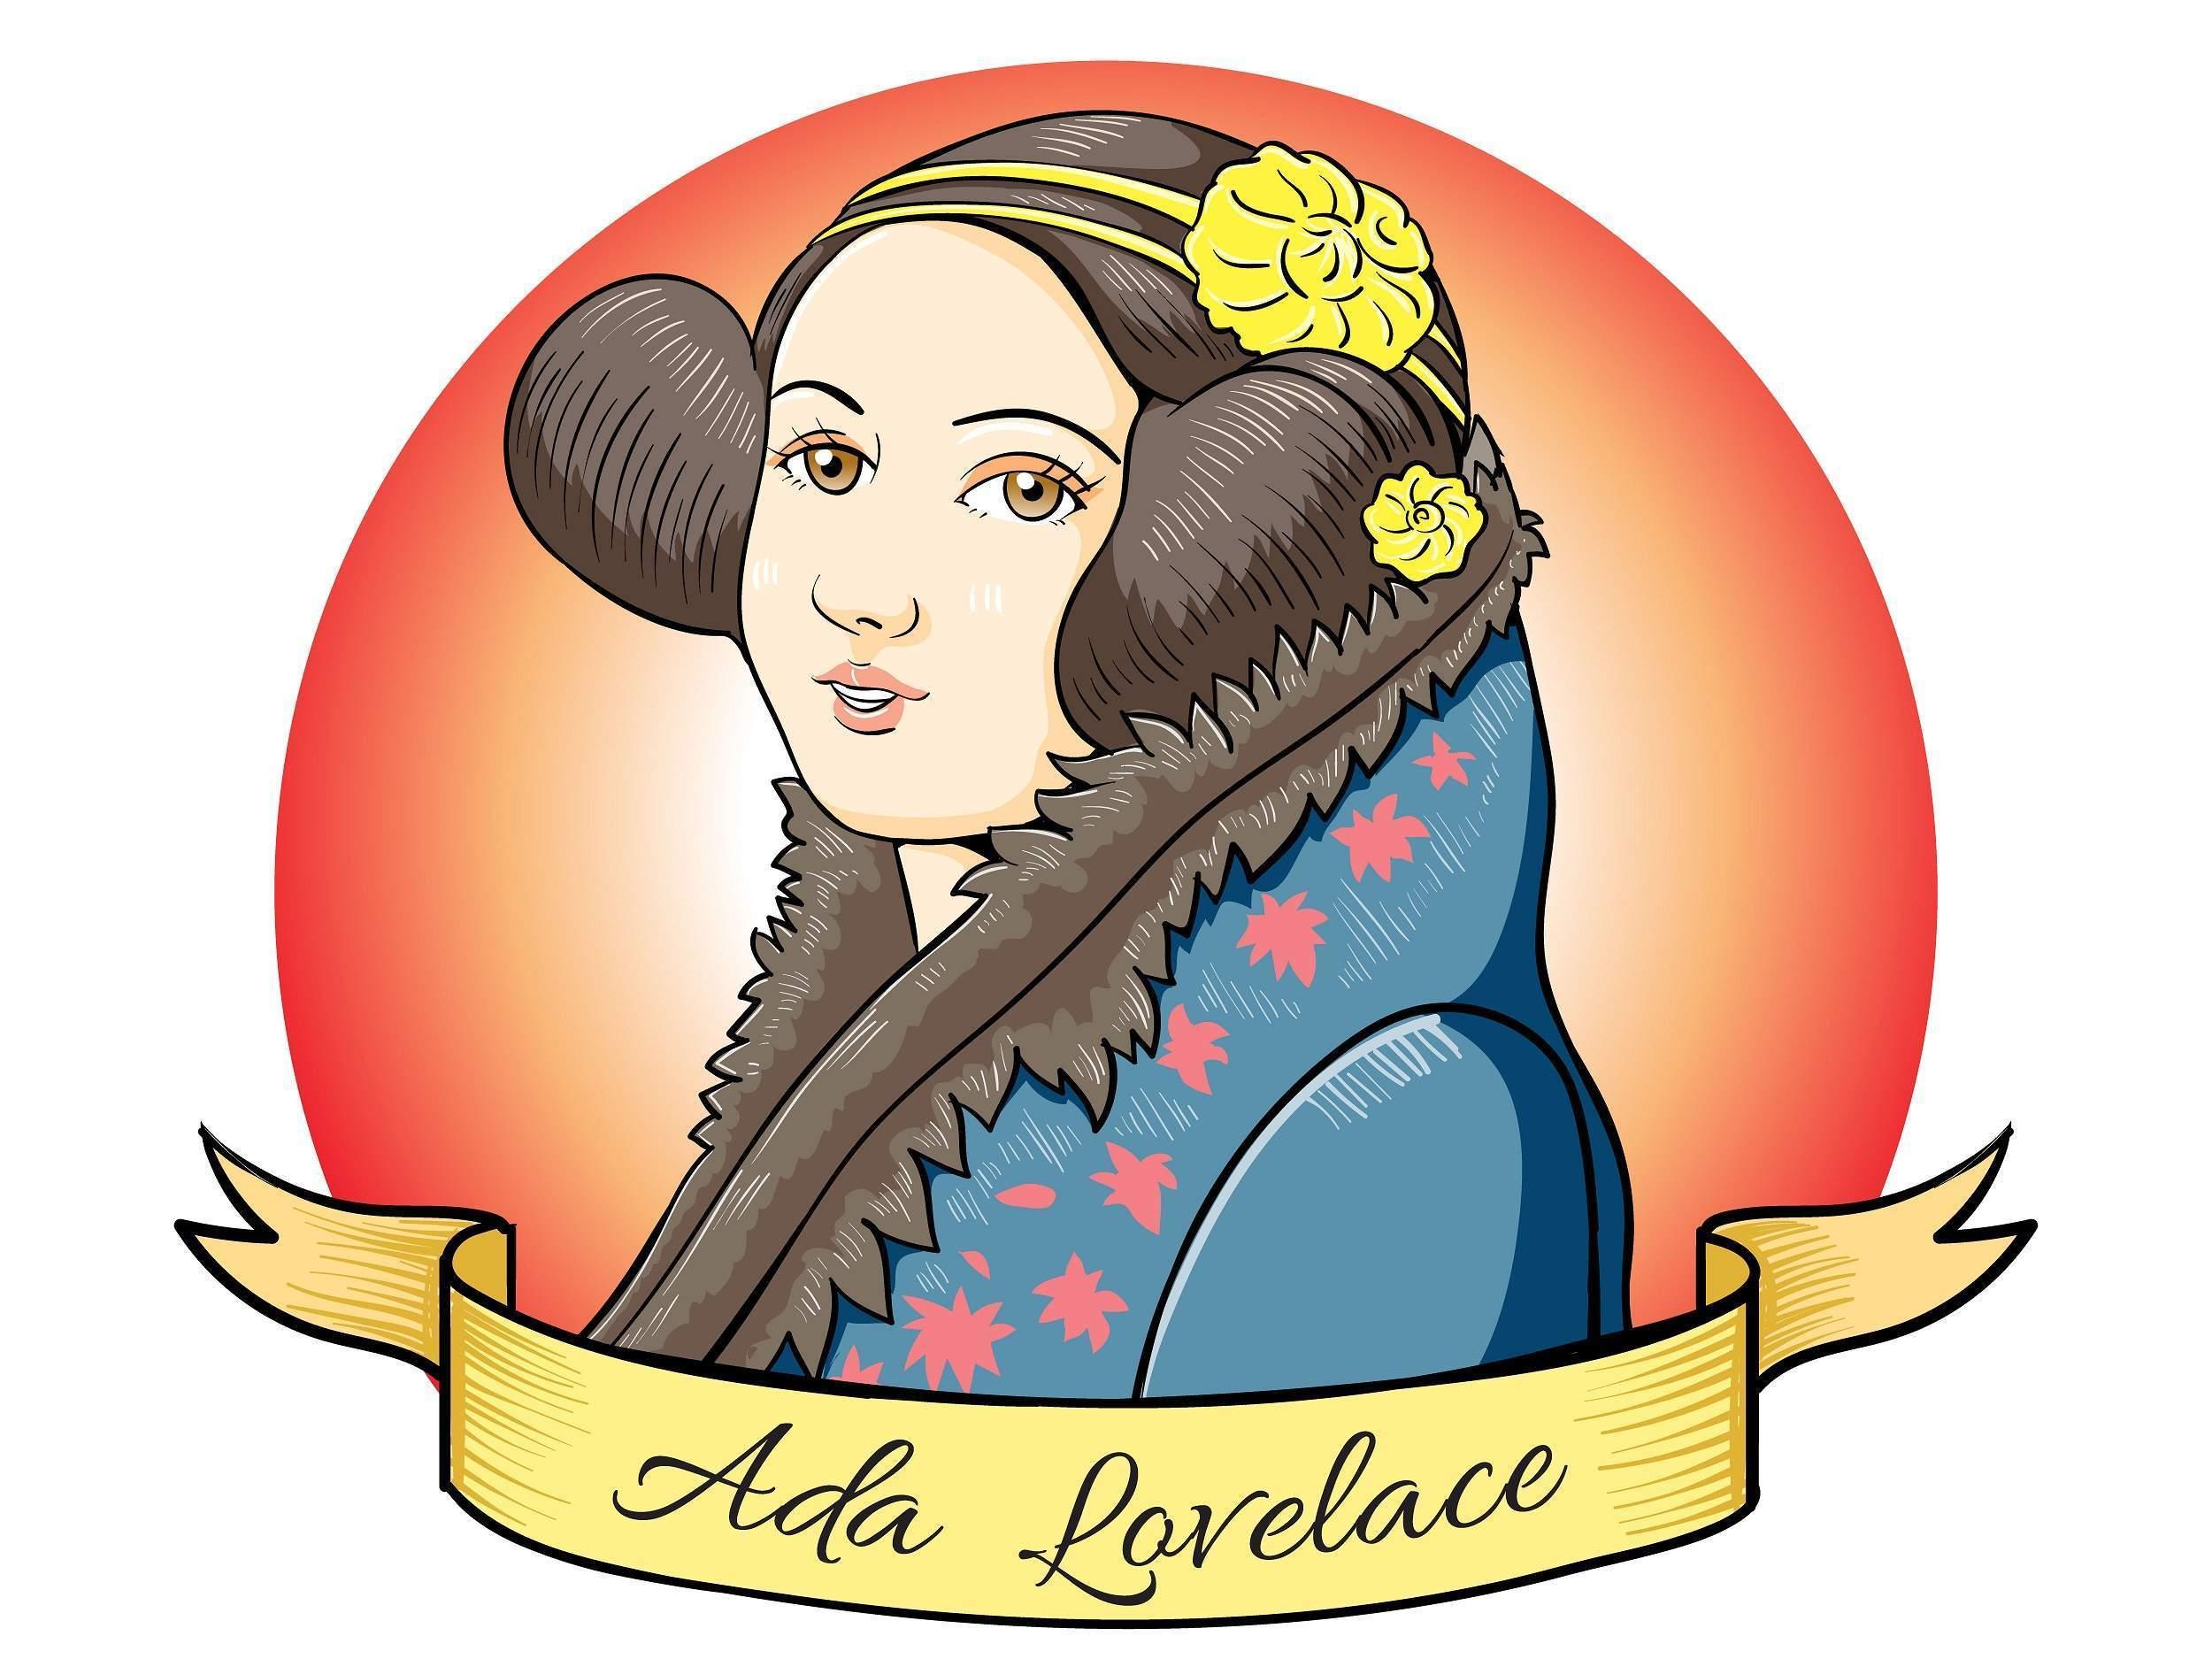 Ada Lovelace Day: Celebrating the pioneering women in STEM